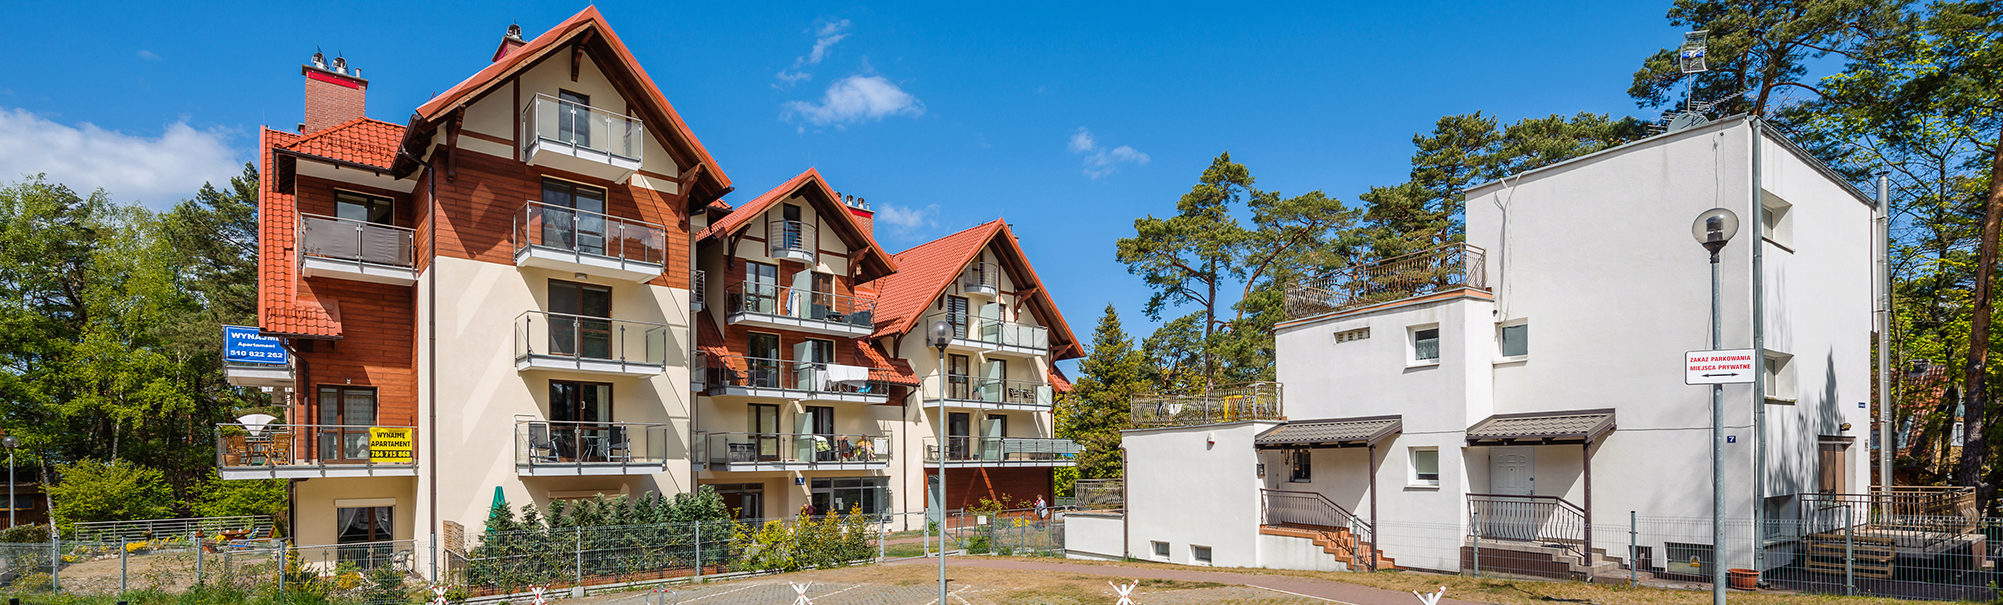 Apartamenty Sun&Snow Żeromskiego Krynica Morska